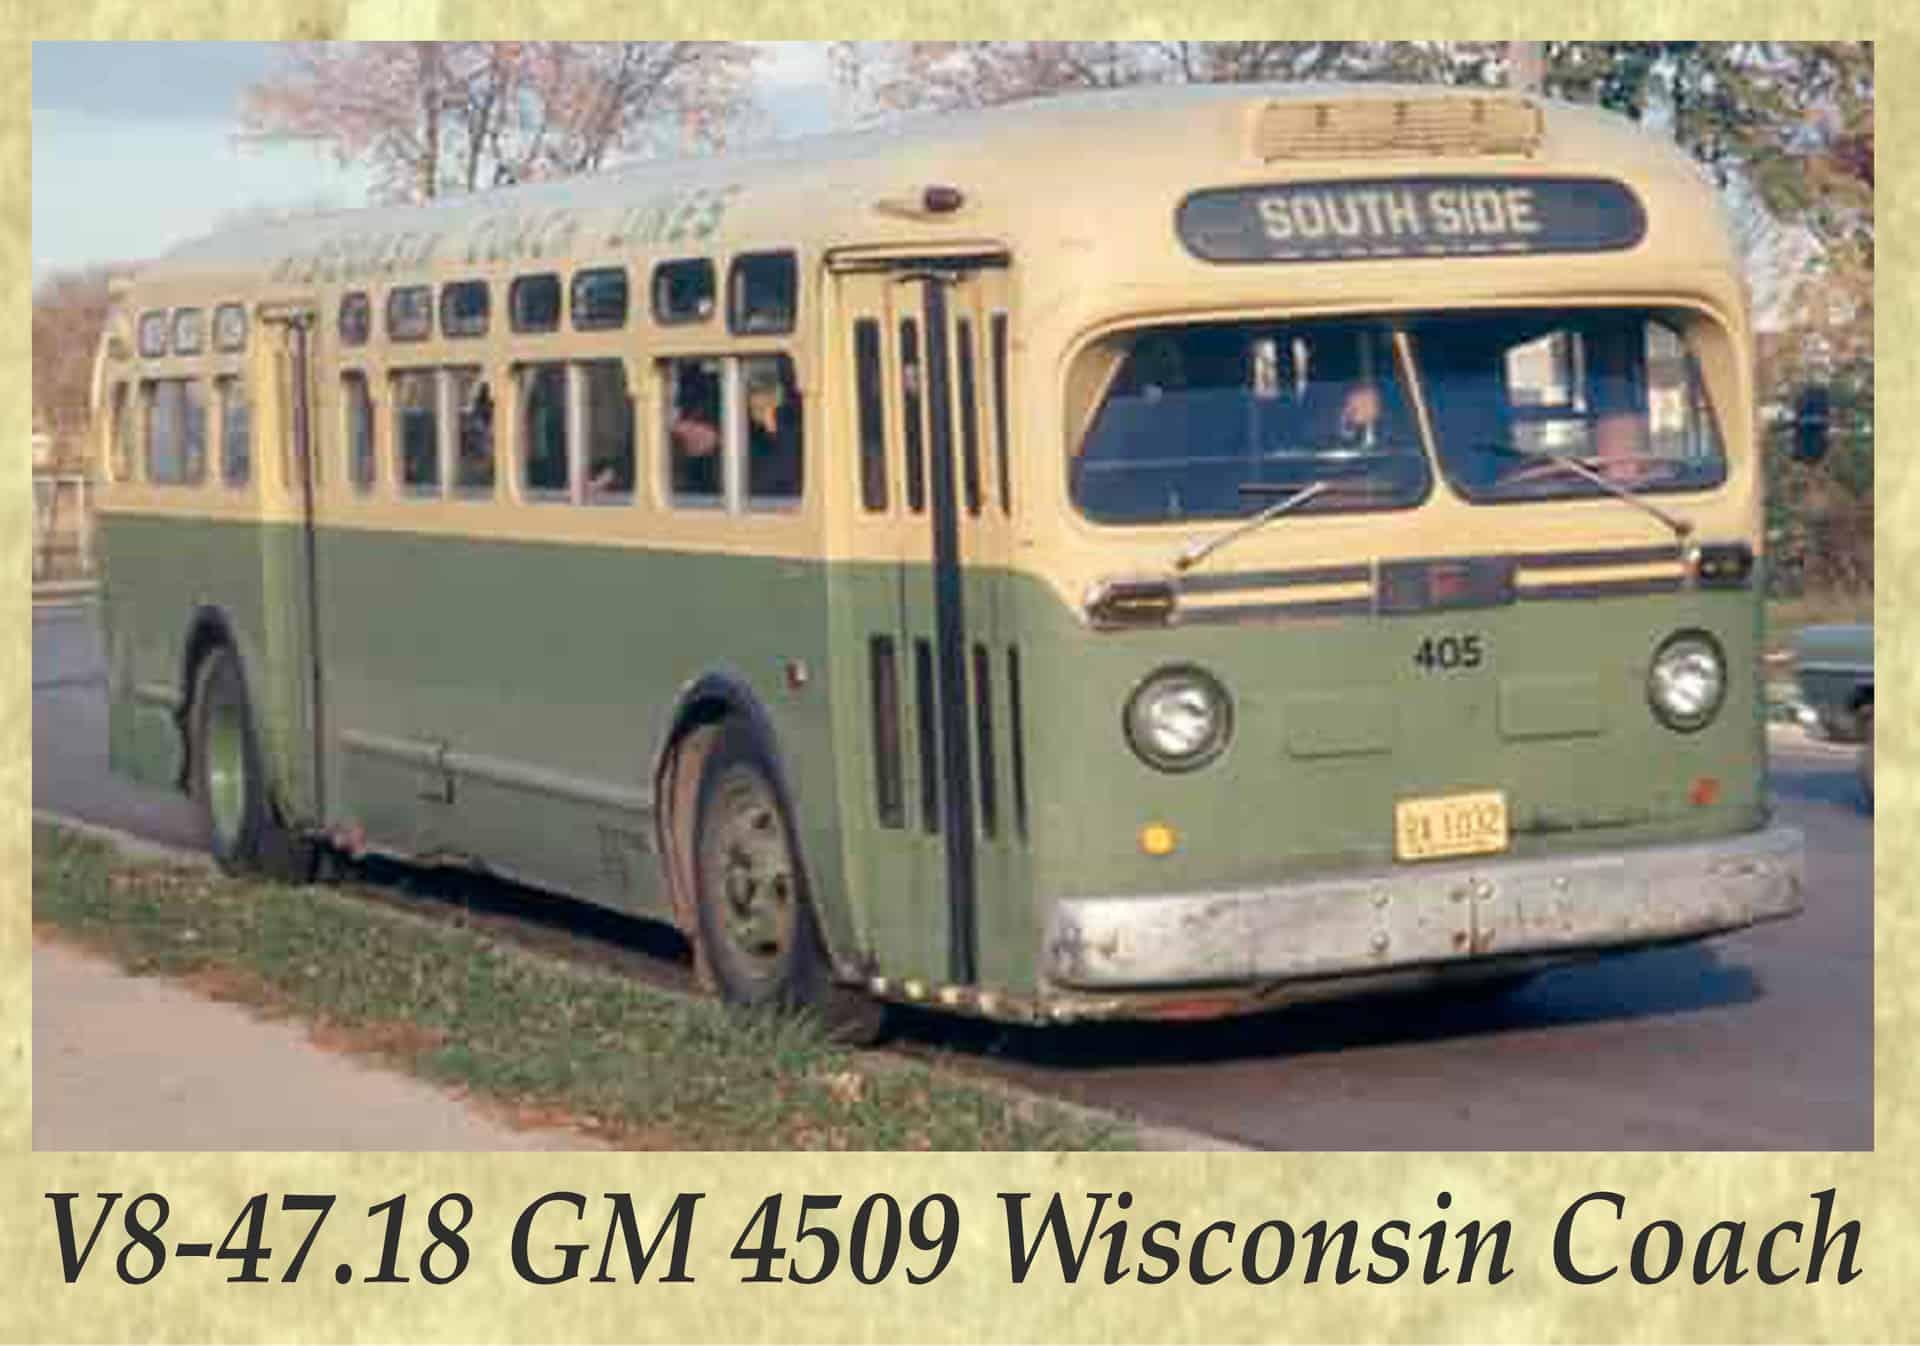 V8-47.18 GM 4509 Wisconsin Coach